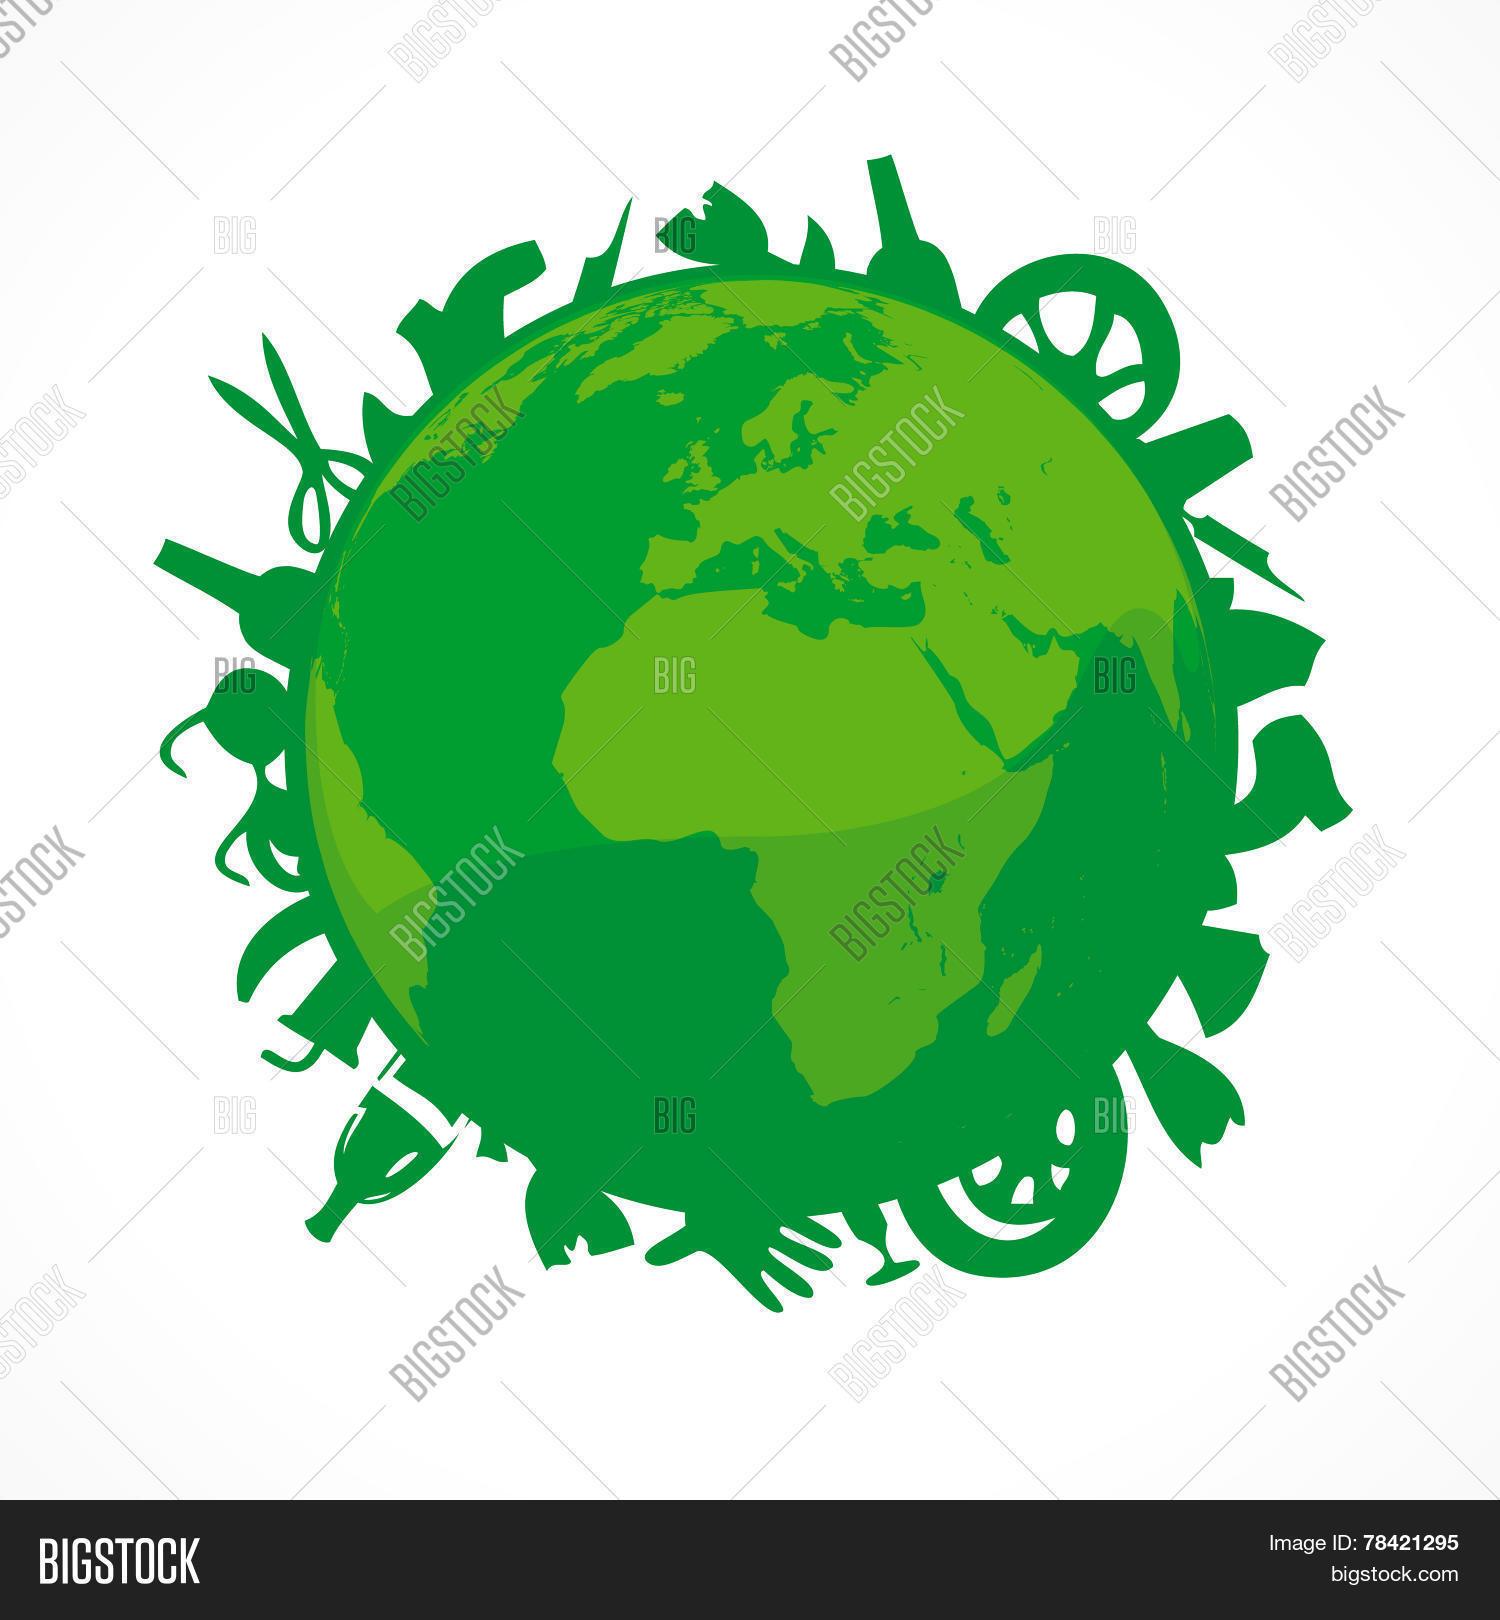 Bionomics Earth Vector Photo Free Trial Bigstock